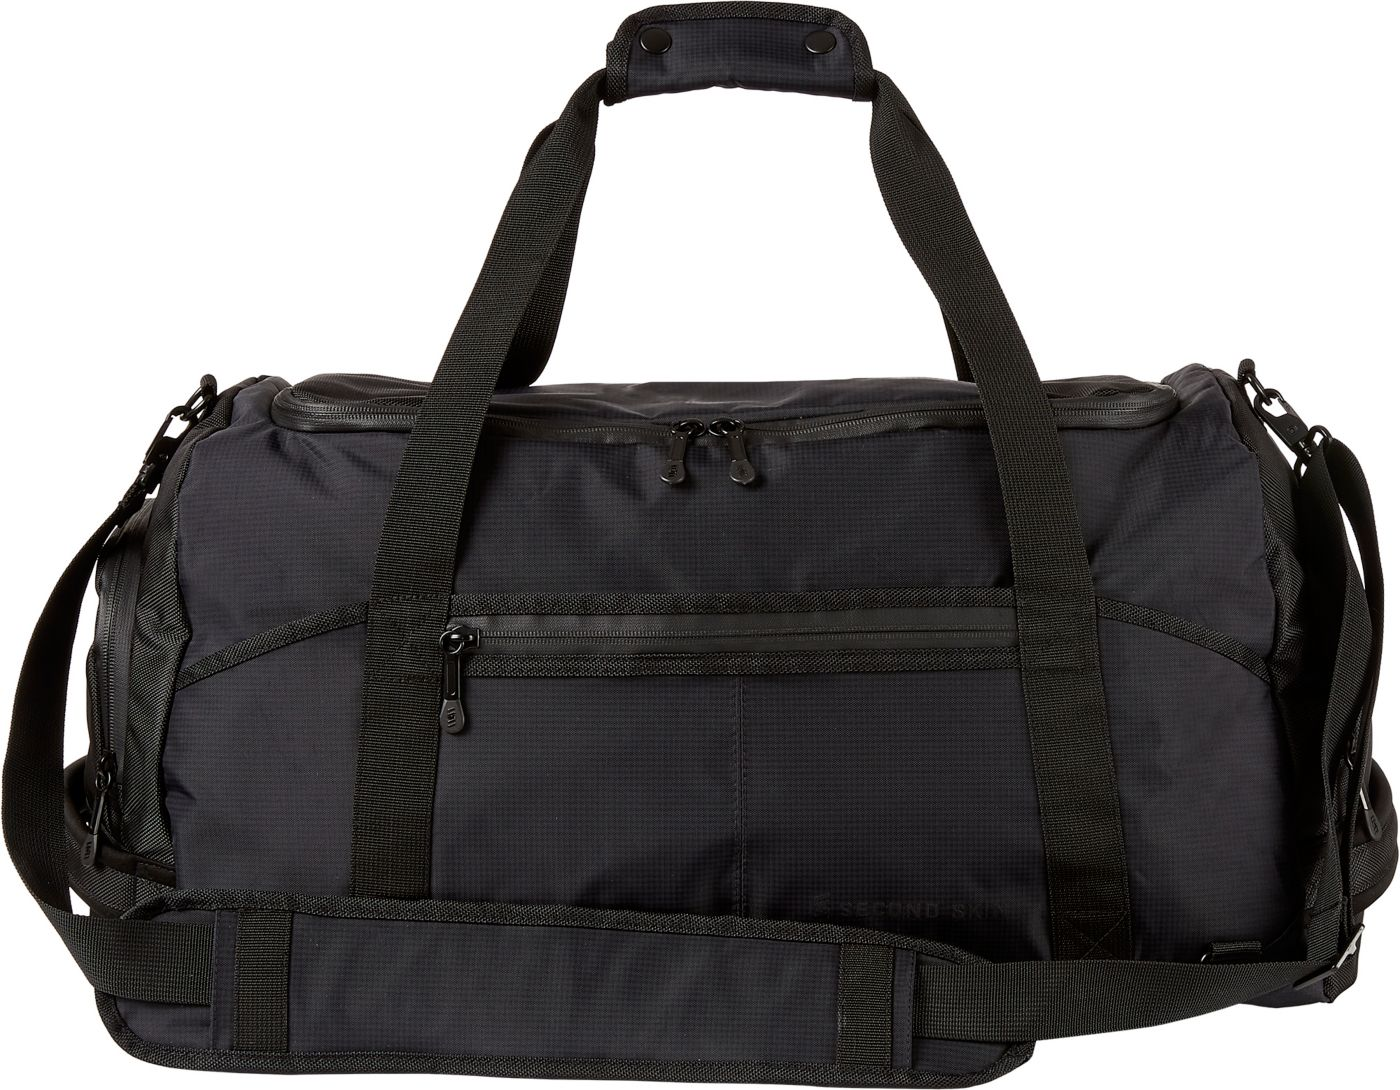 SECOND SKIN Core Duffle Bag